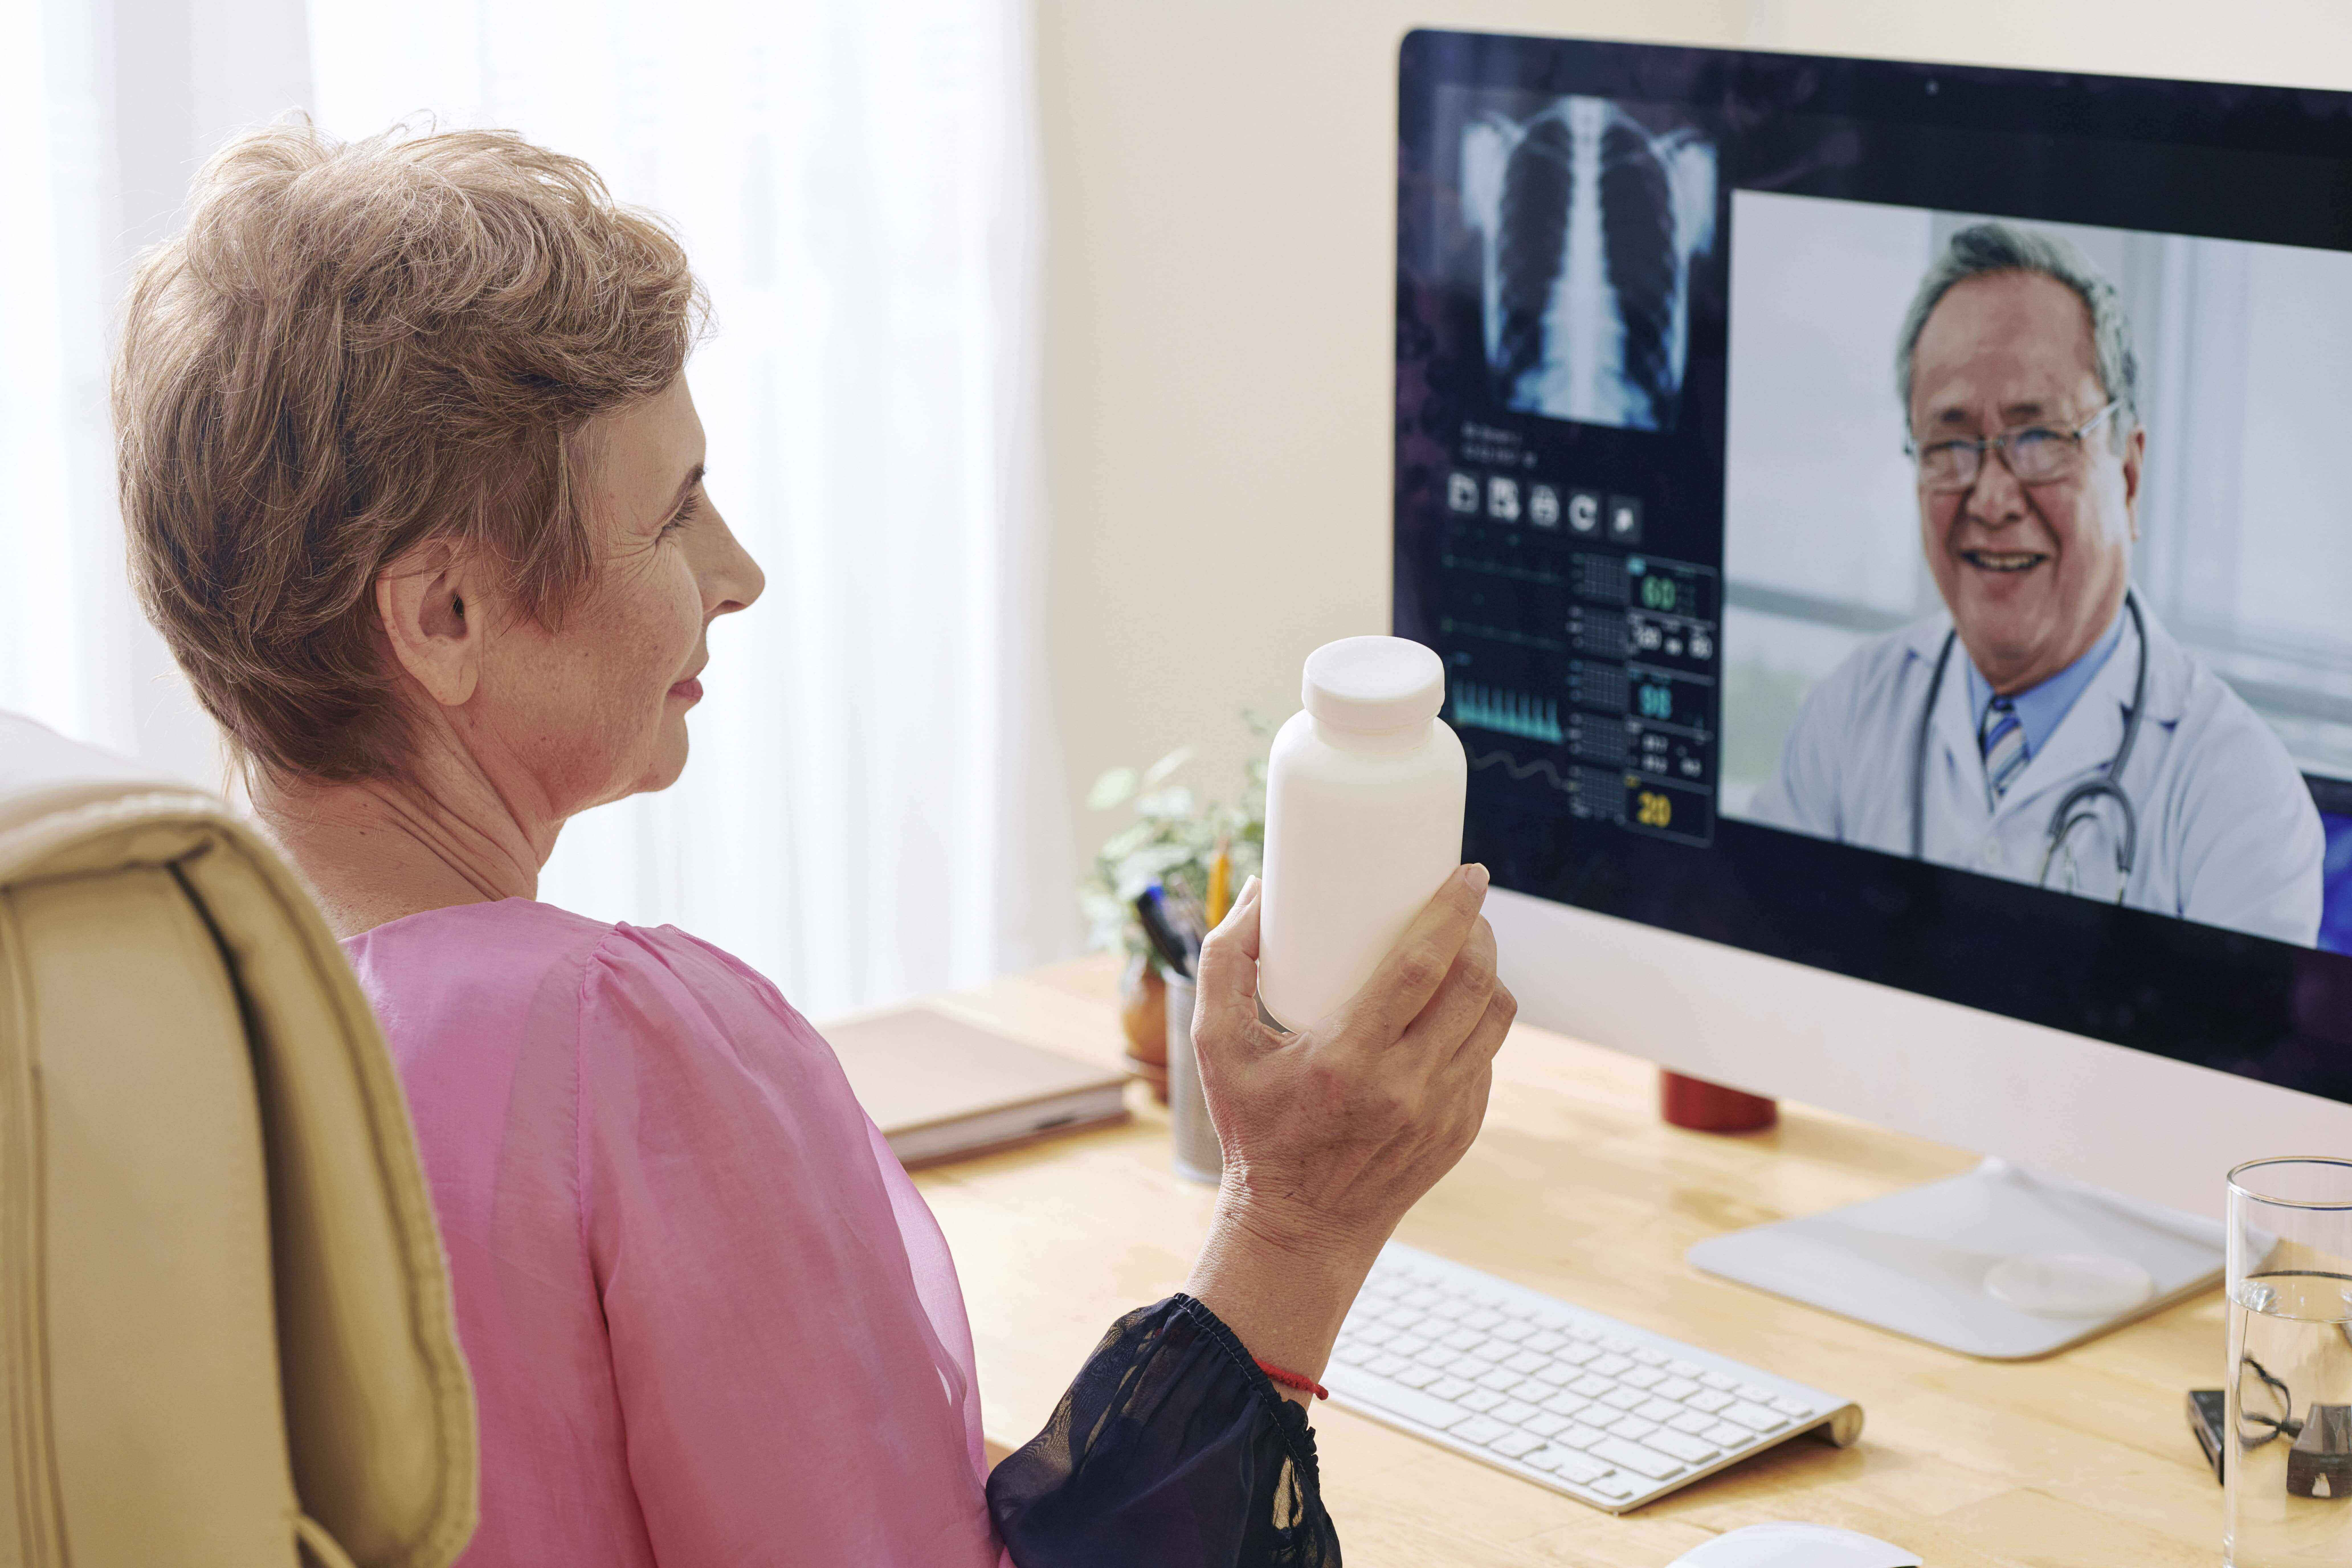 Urology telemedicine